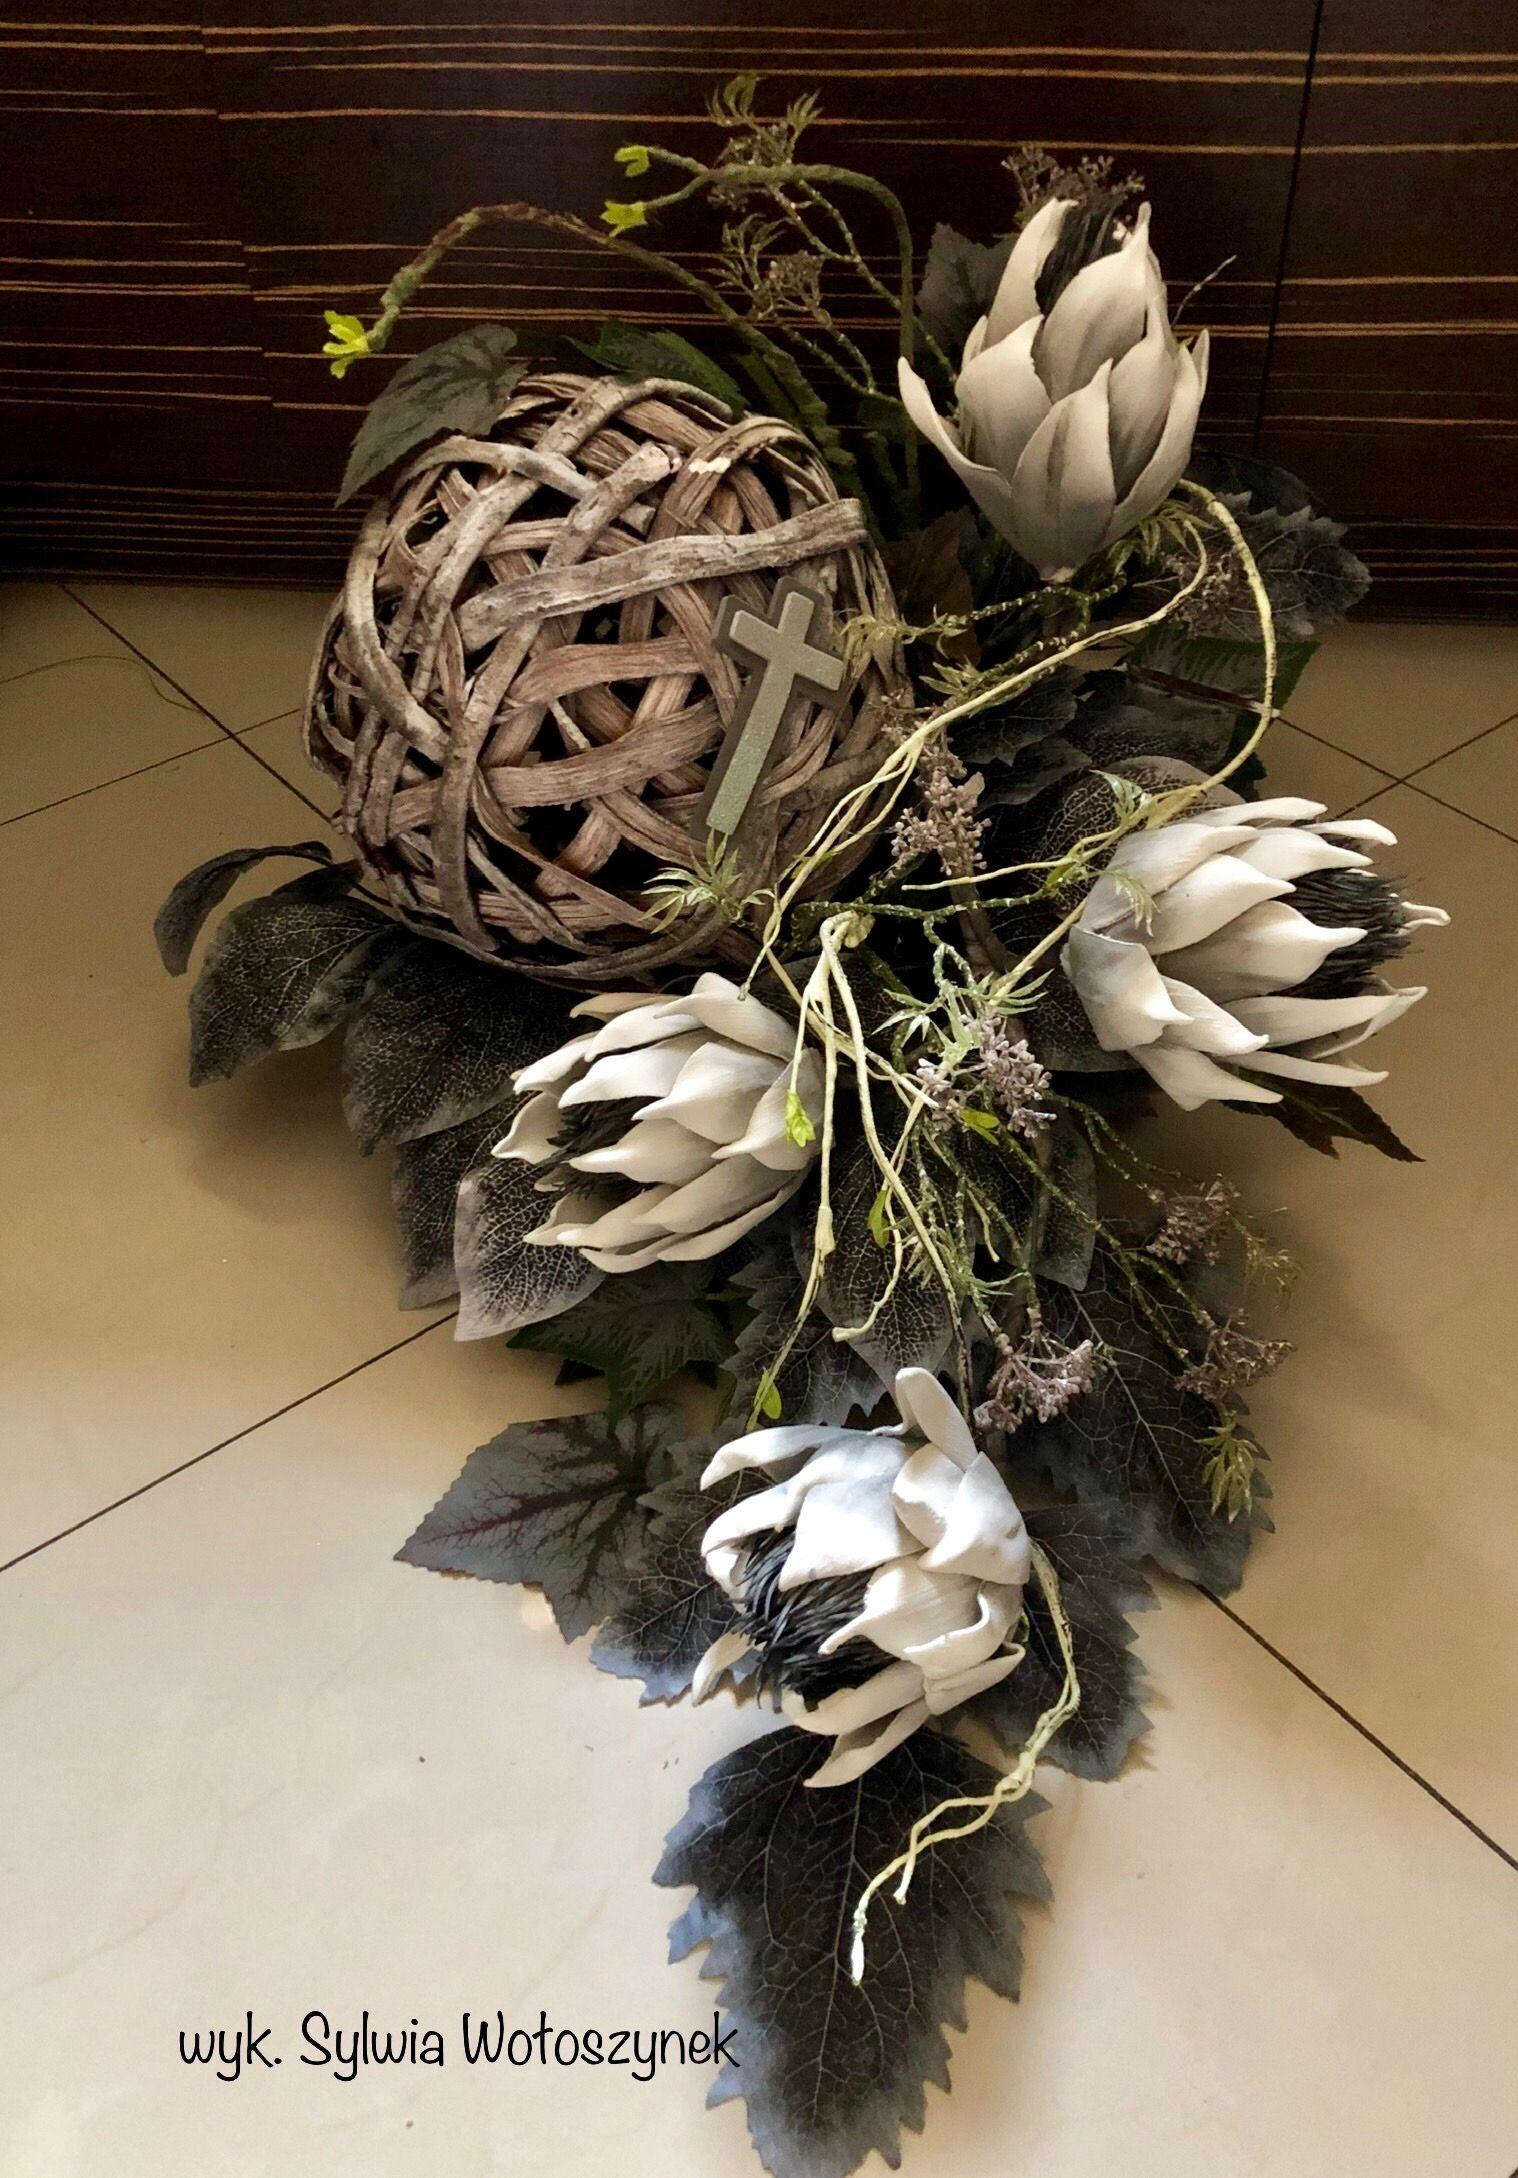 Kompozycja Nagrobna 2018 Wyk Sylwia Woloszynek Funeral Floral Funeral Flower Arrangements Flower Decorations